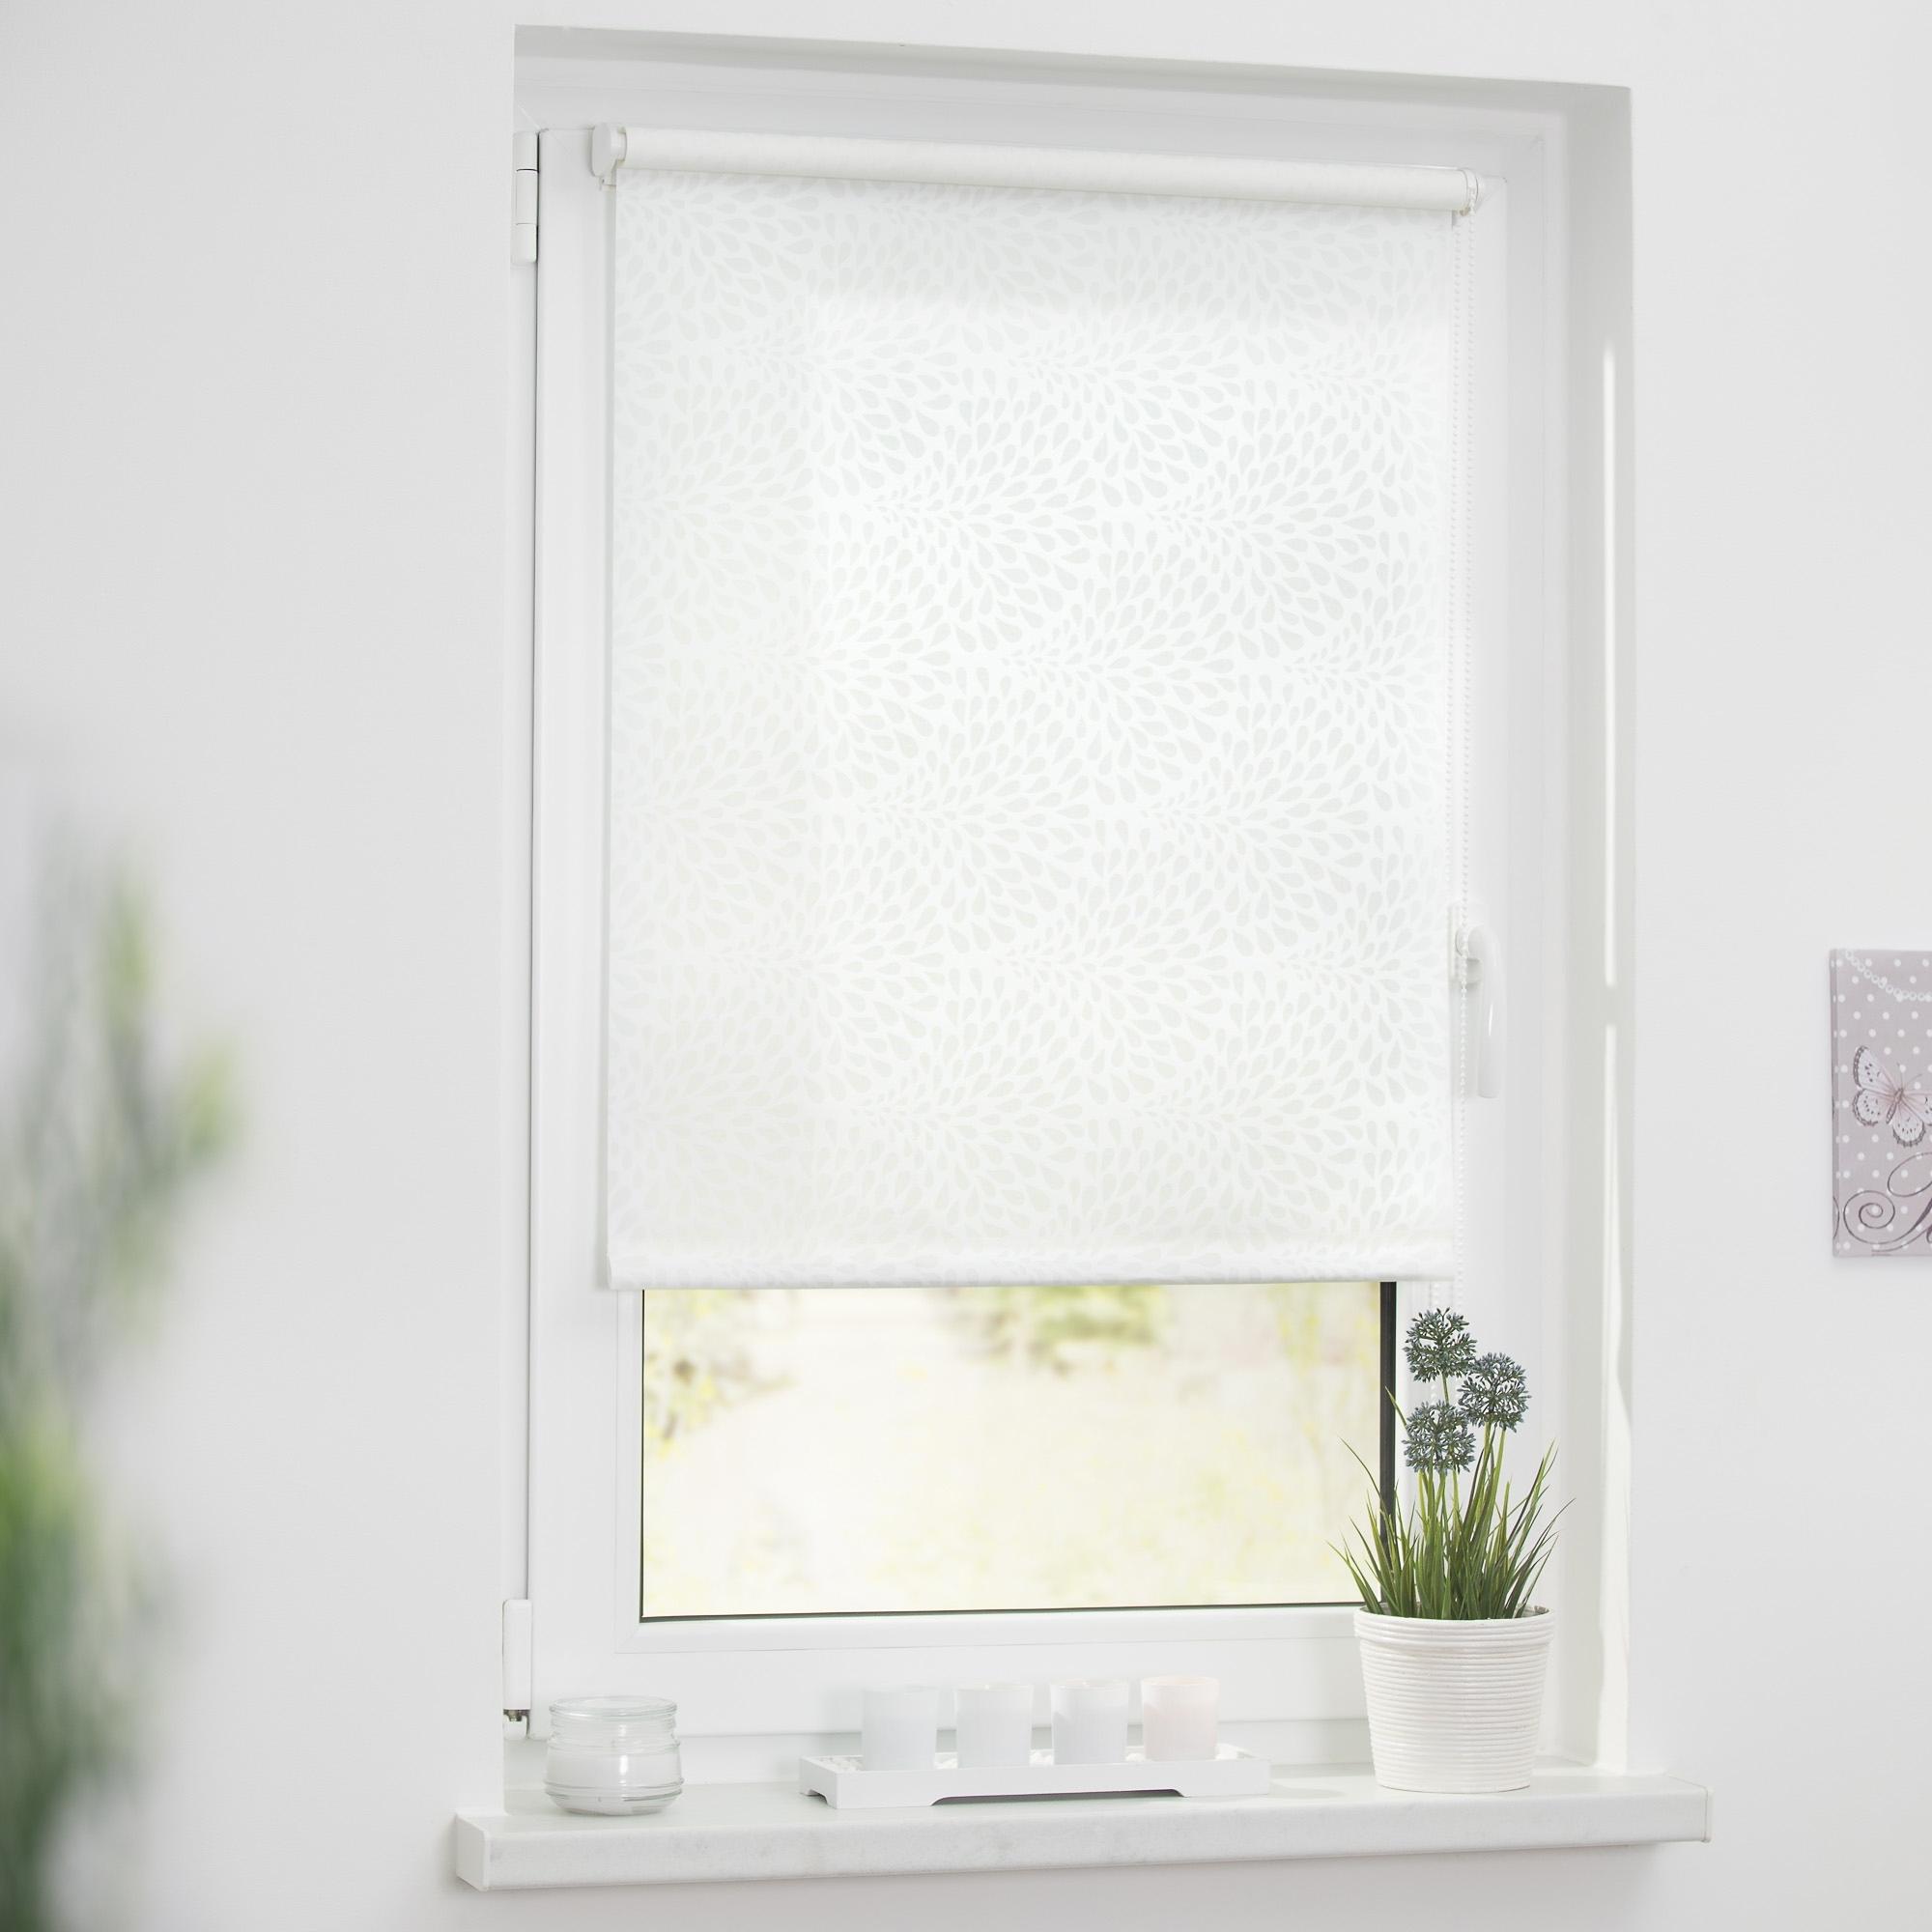 lichtblick rolgordijn klemmfix decor drops online bij otto. Black Bedroom Furniture Sets. Home Design Ideas